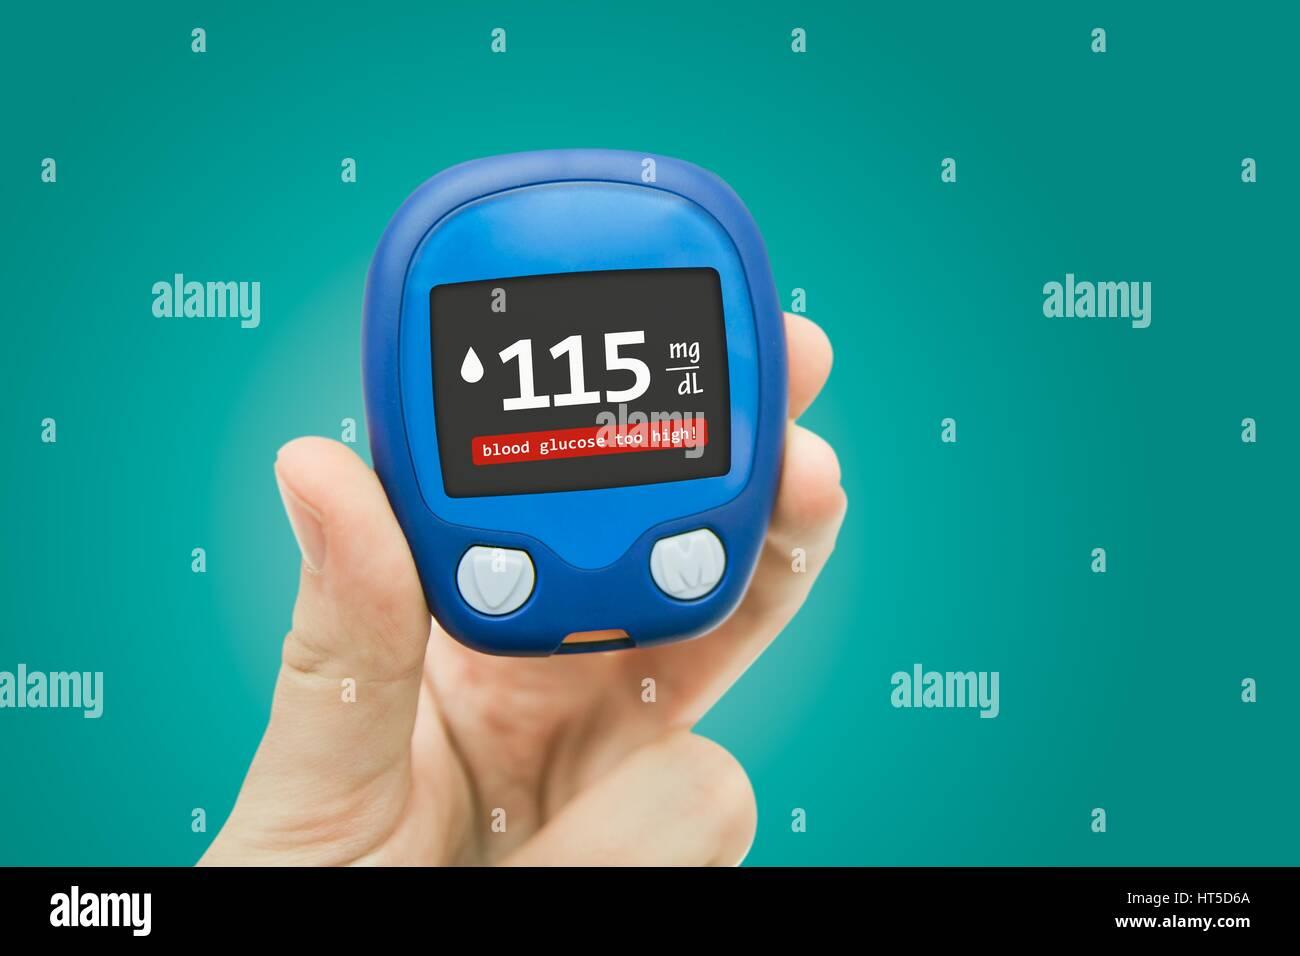 Hand holding meter. Diabetes doing glucose level test. Medical background concept - Stock Image